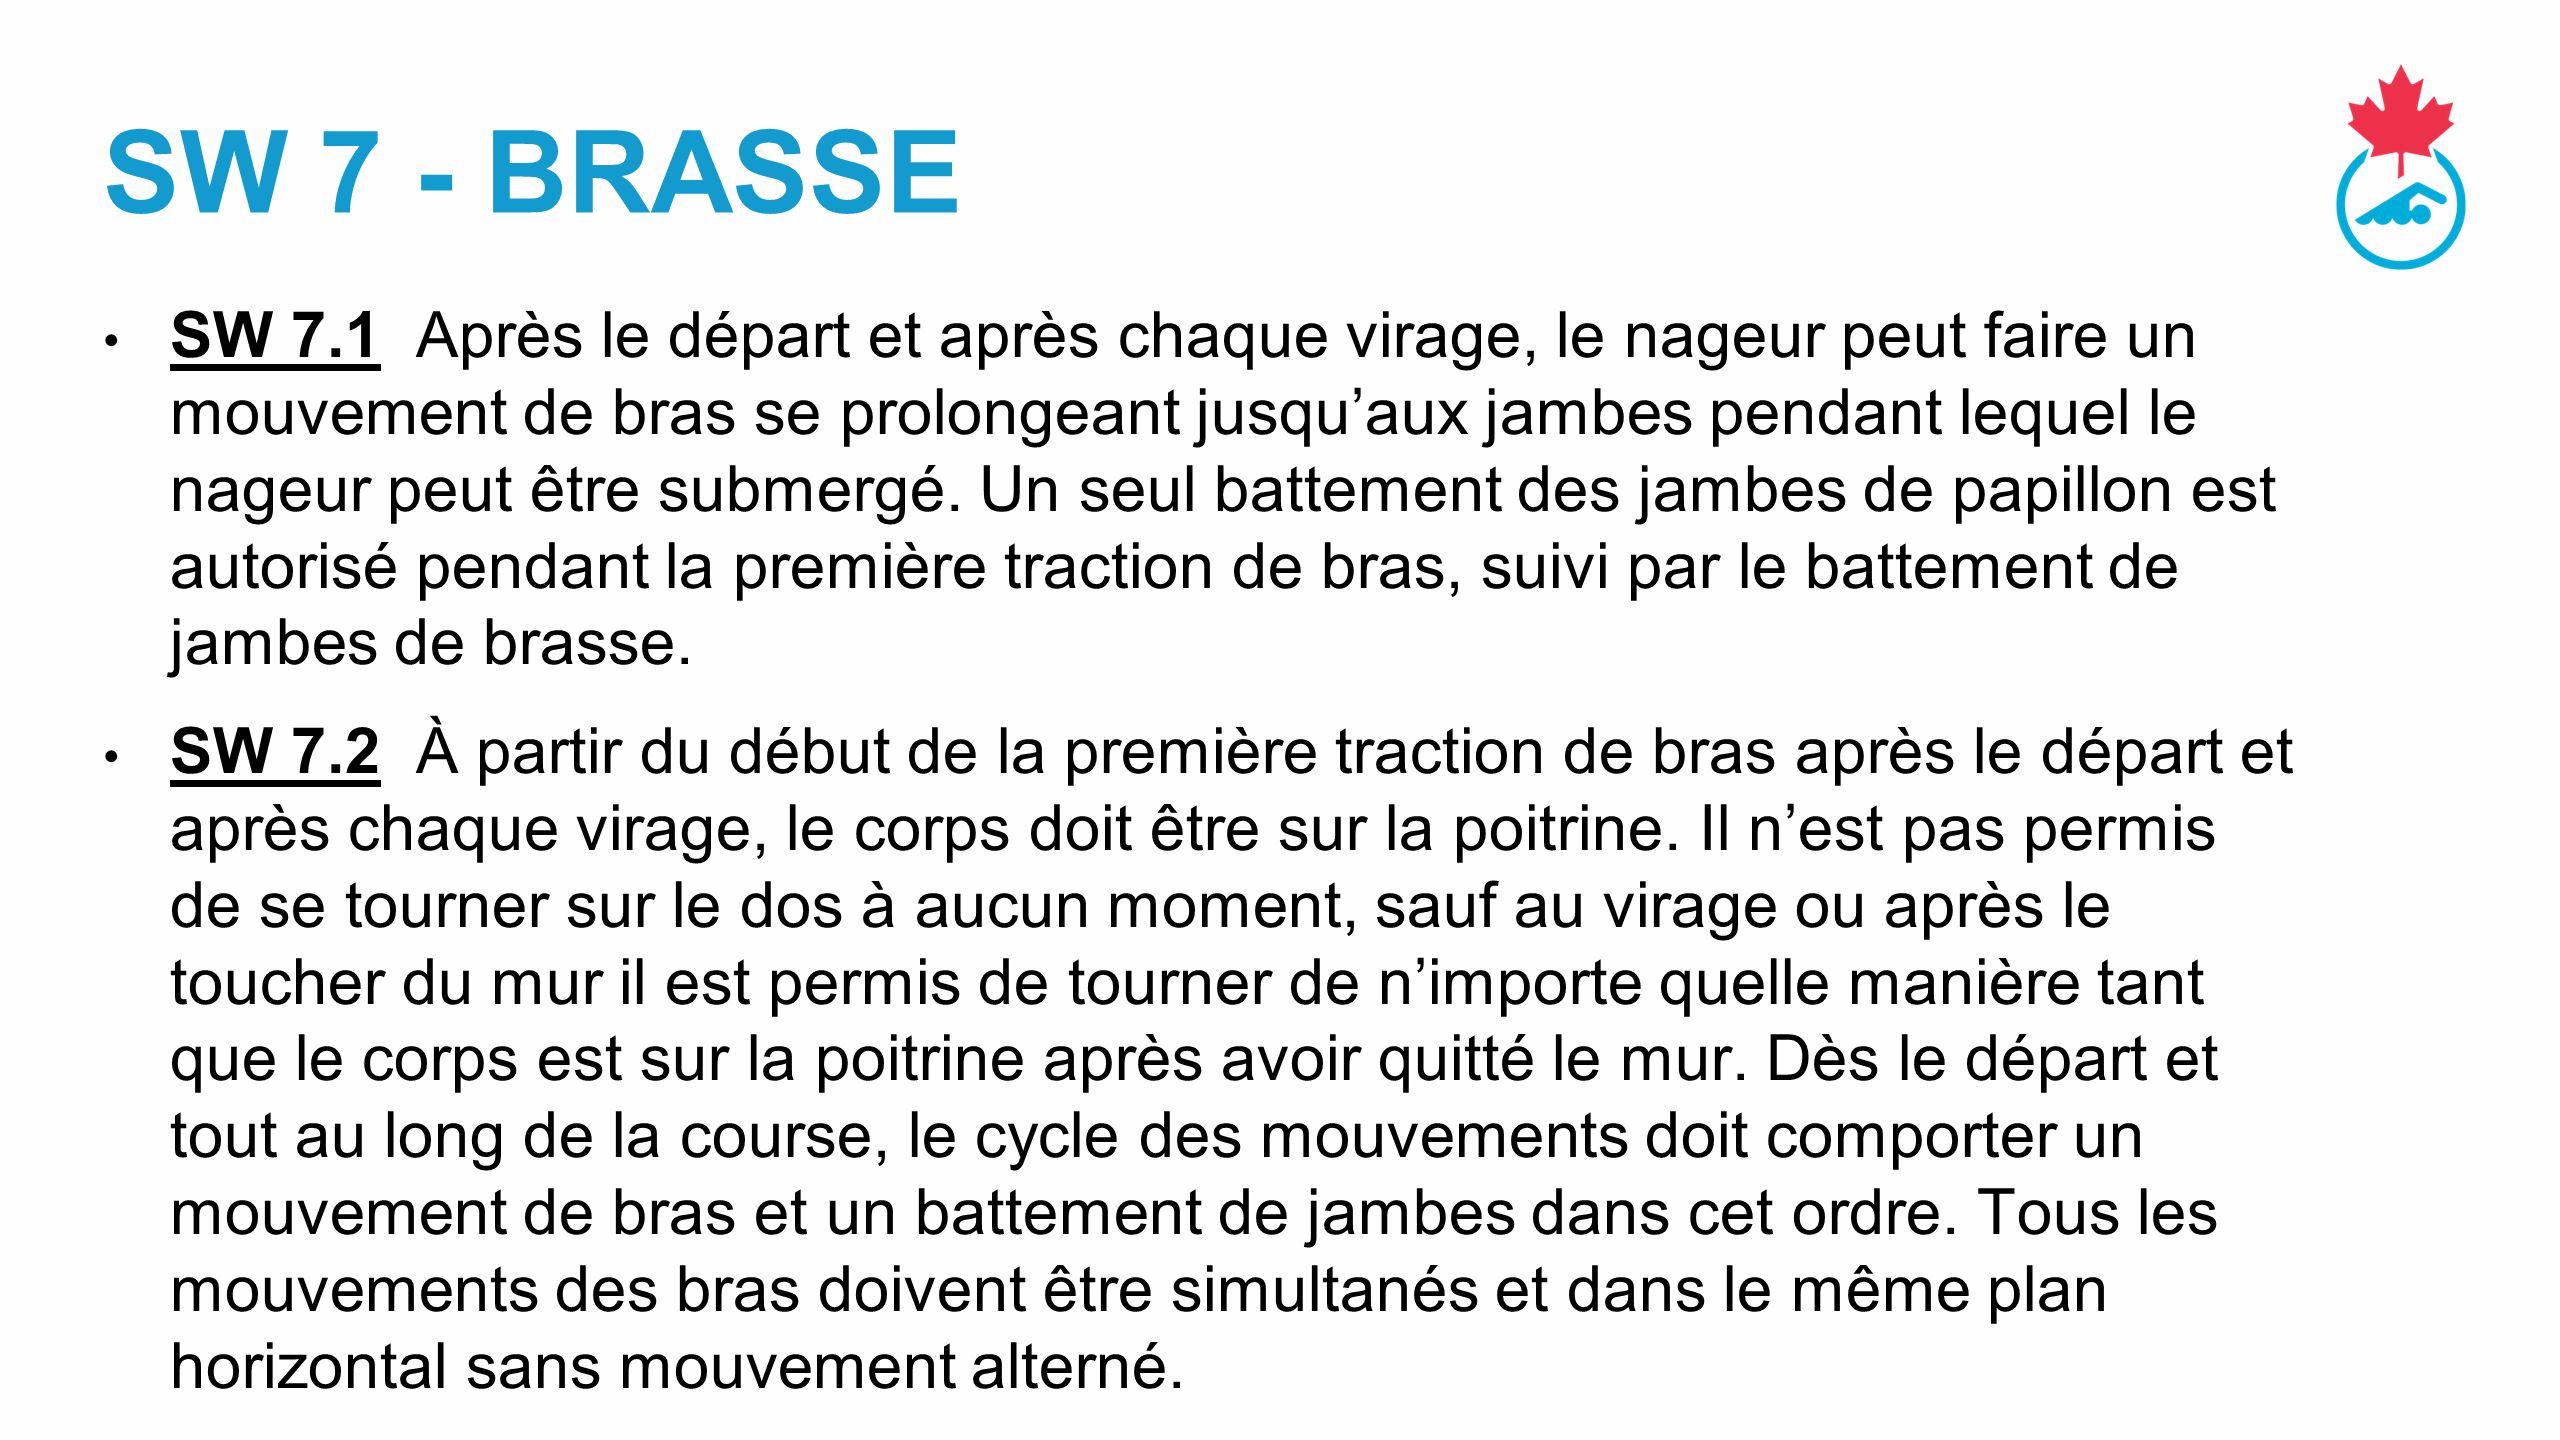 SW 7 - BRASSE